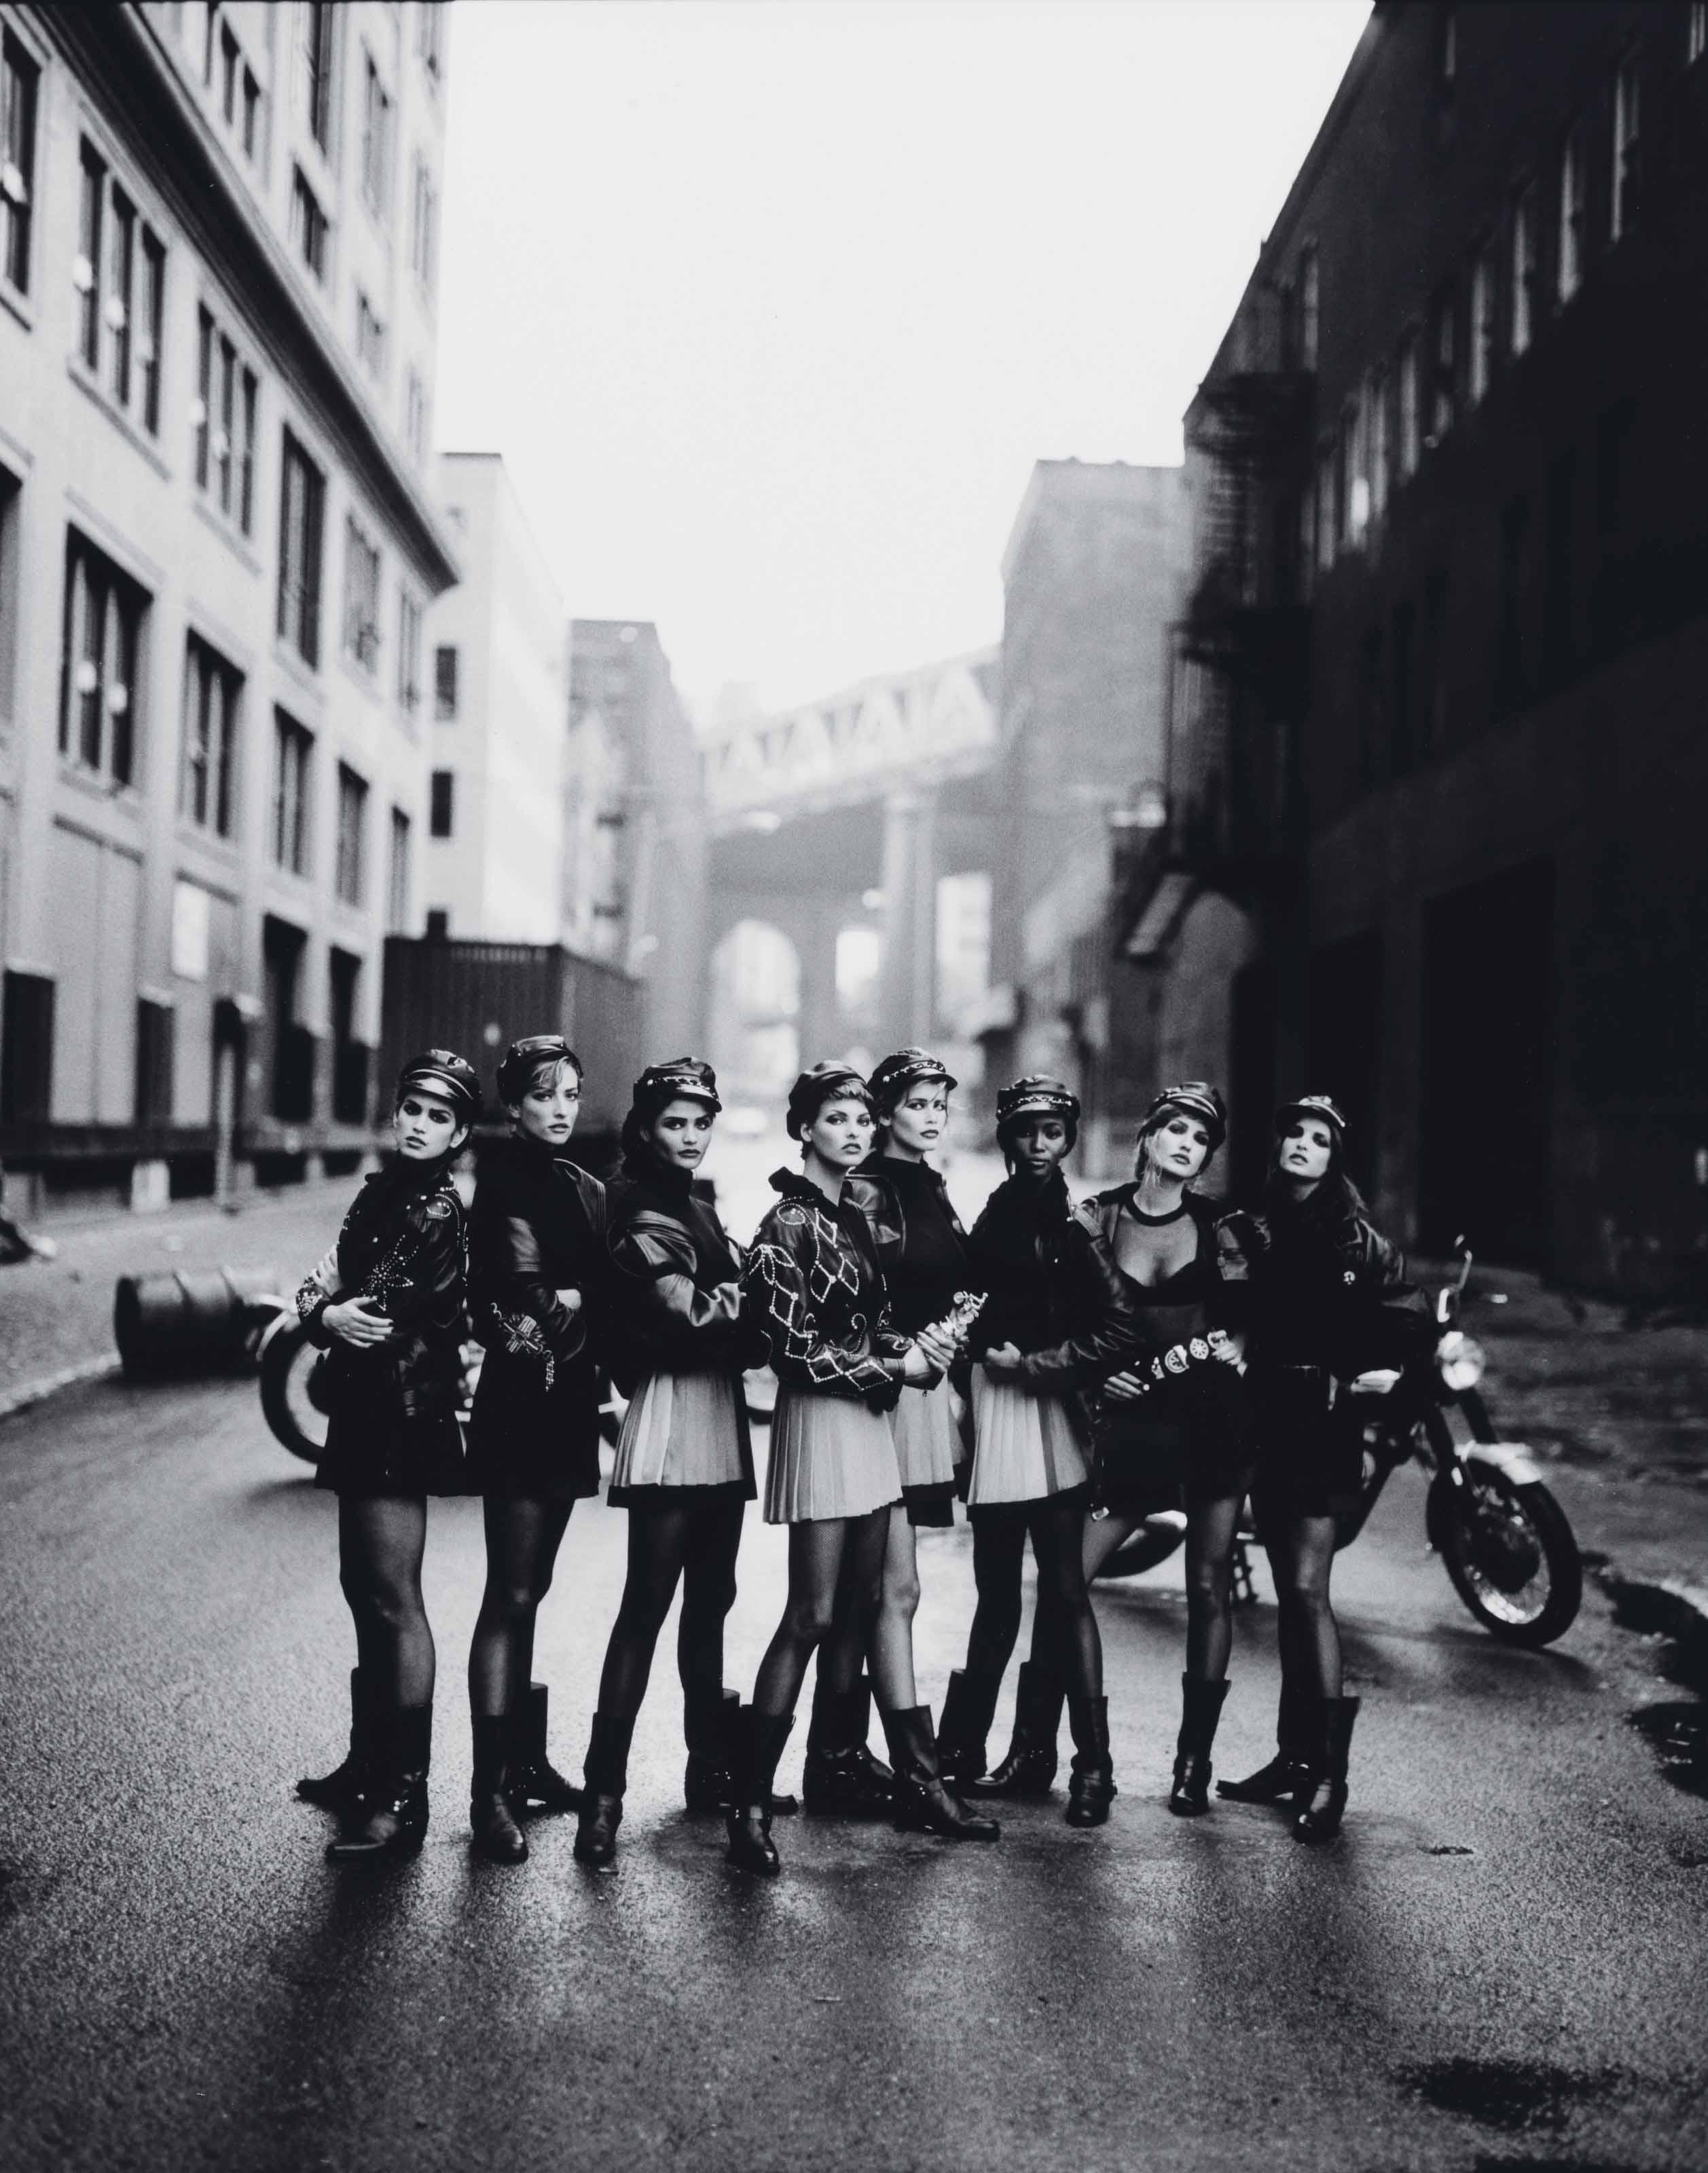 Cindy Crawford, Tatjana Patitz, Helena Chirstensen, Linda Evangelista, Claudia Schiffer, Naomi Campbell, Karen Mulder & Stephanie Seymour, for Vogue, Brooklyn, New York, 1991